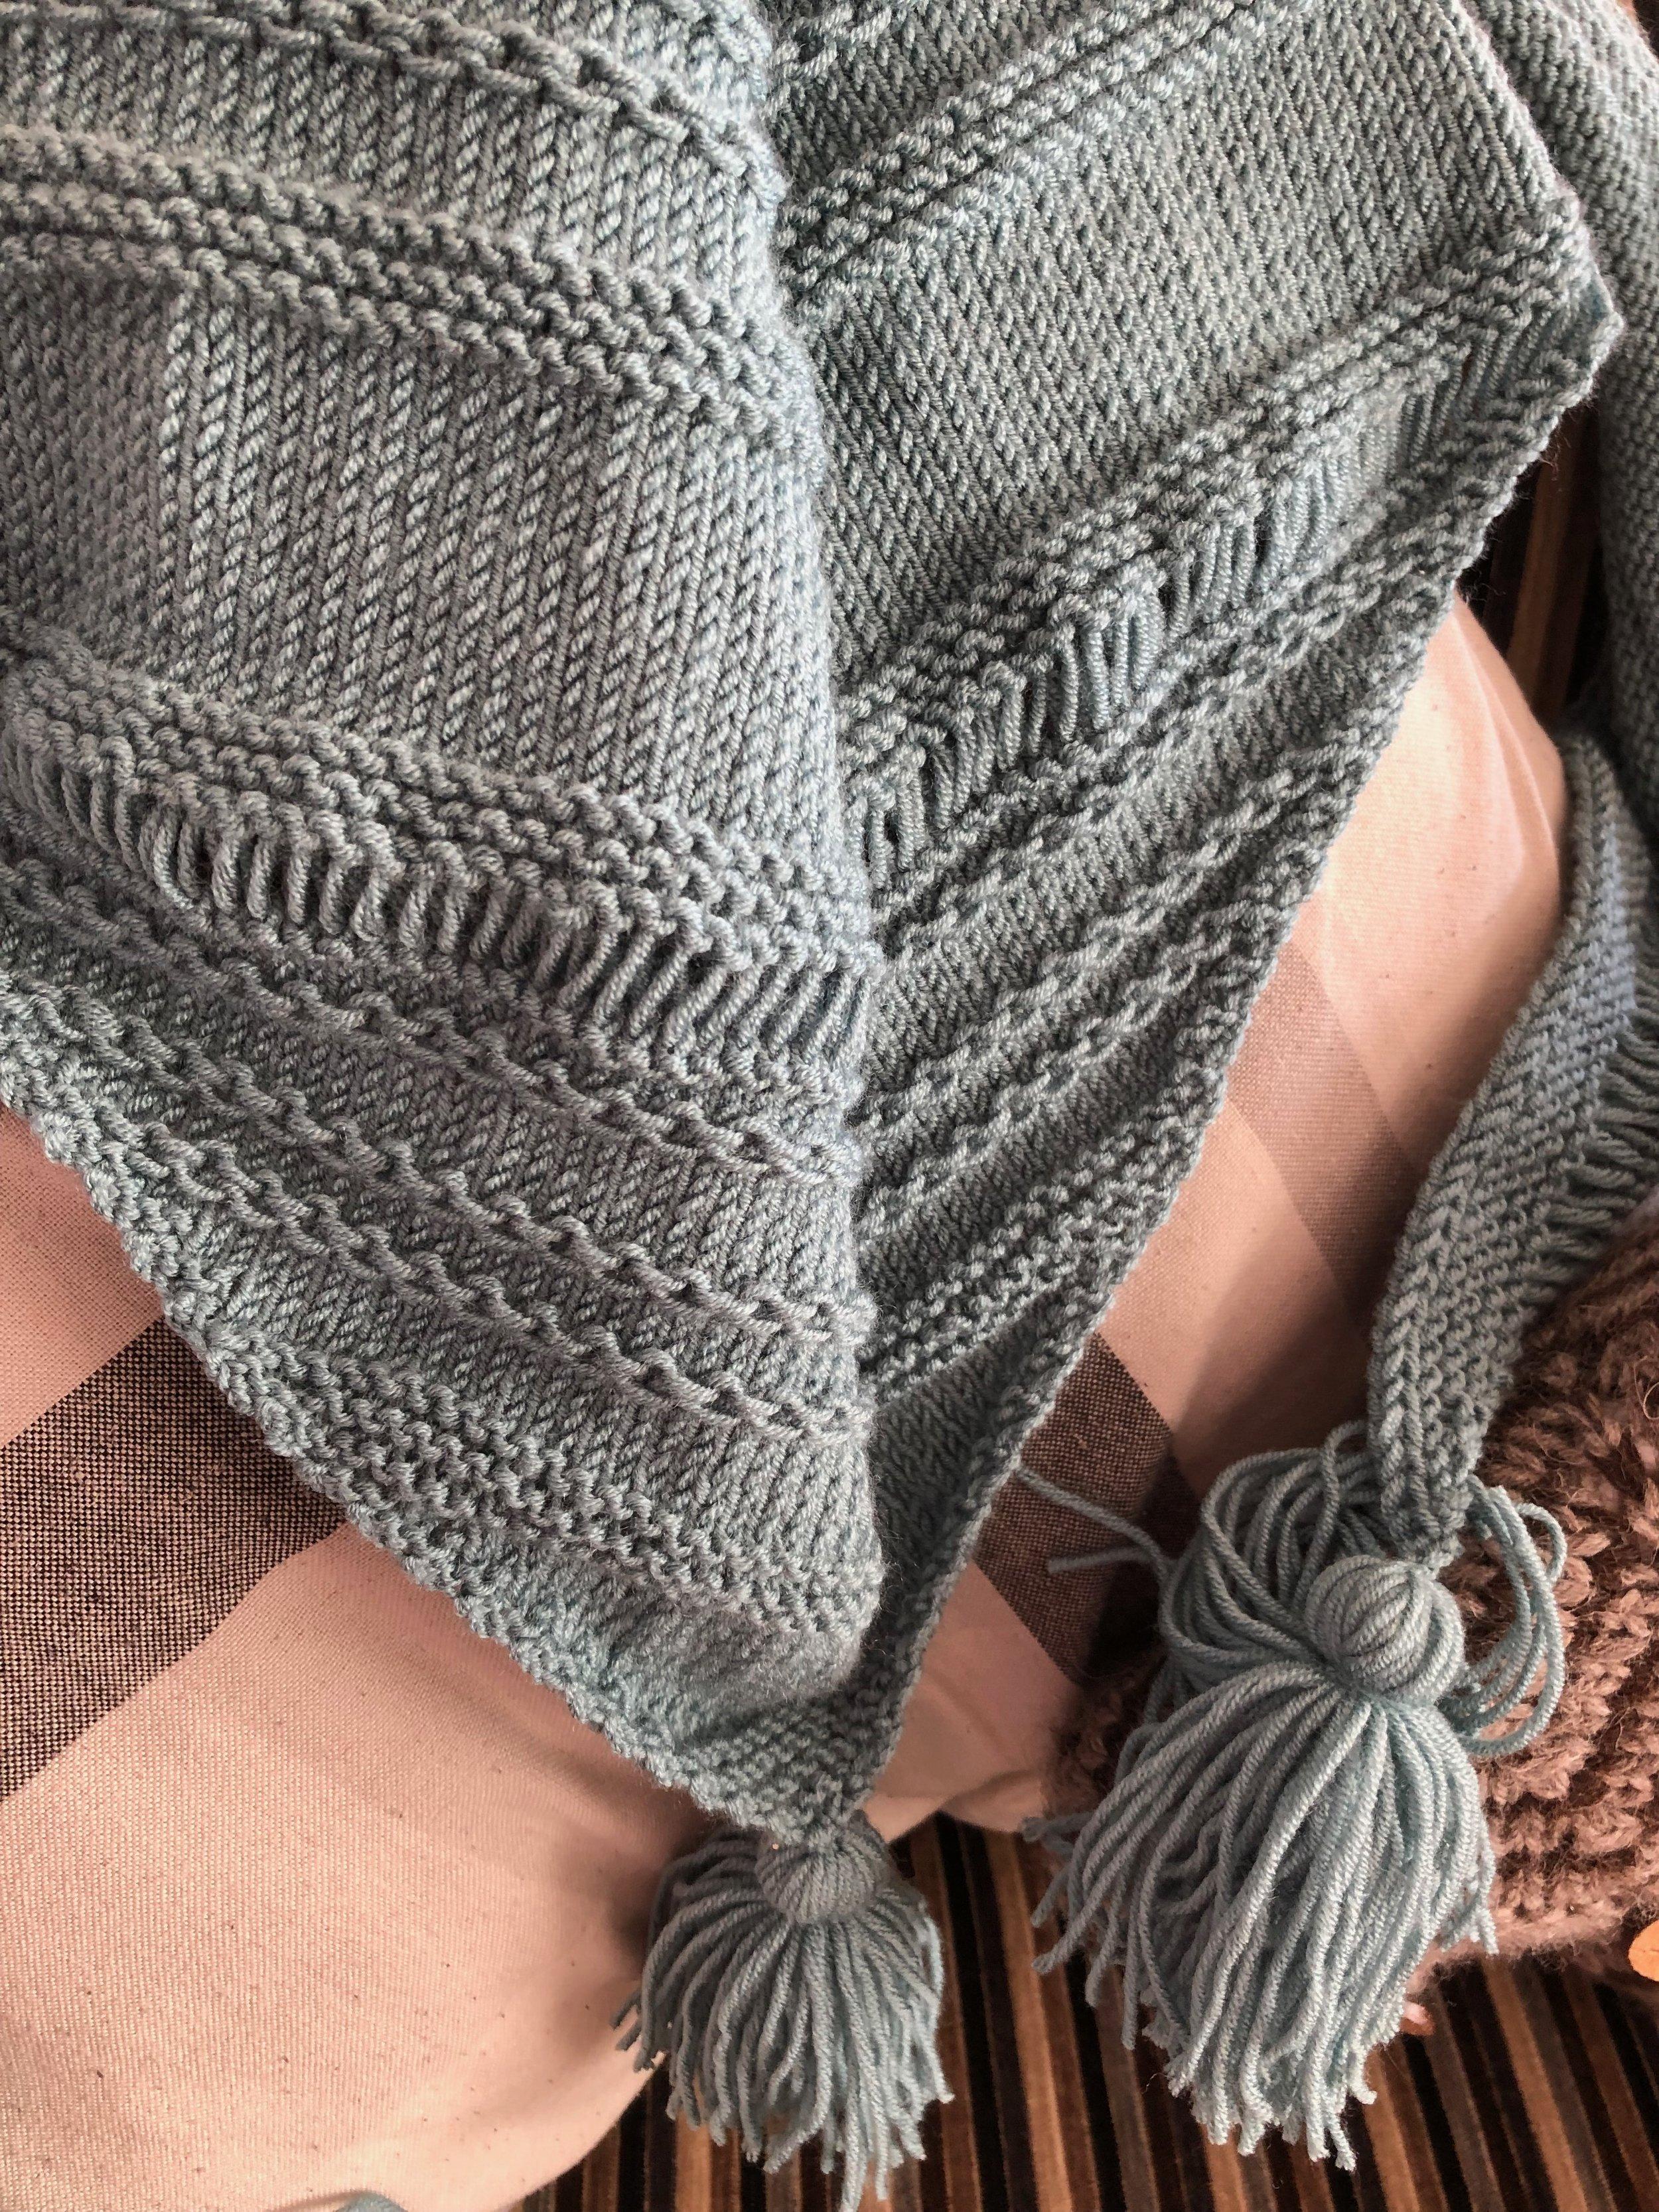 Chain Reaction Shawl Knitting Pattern